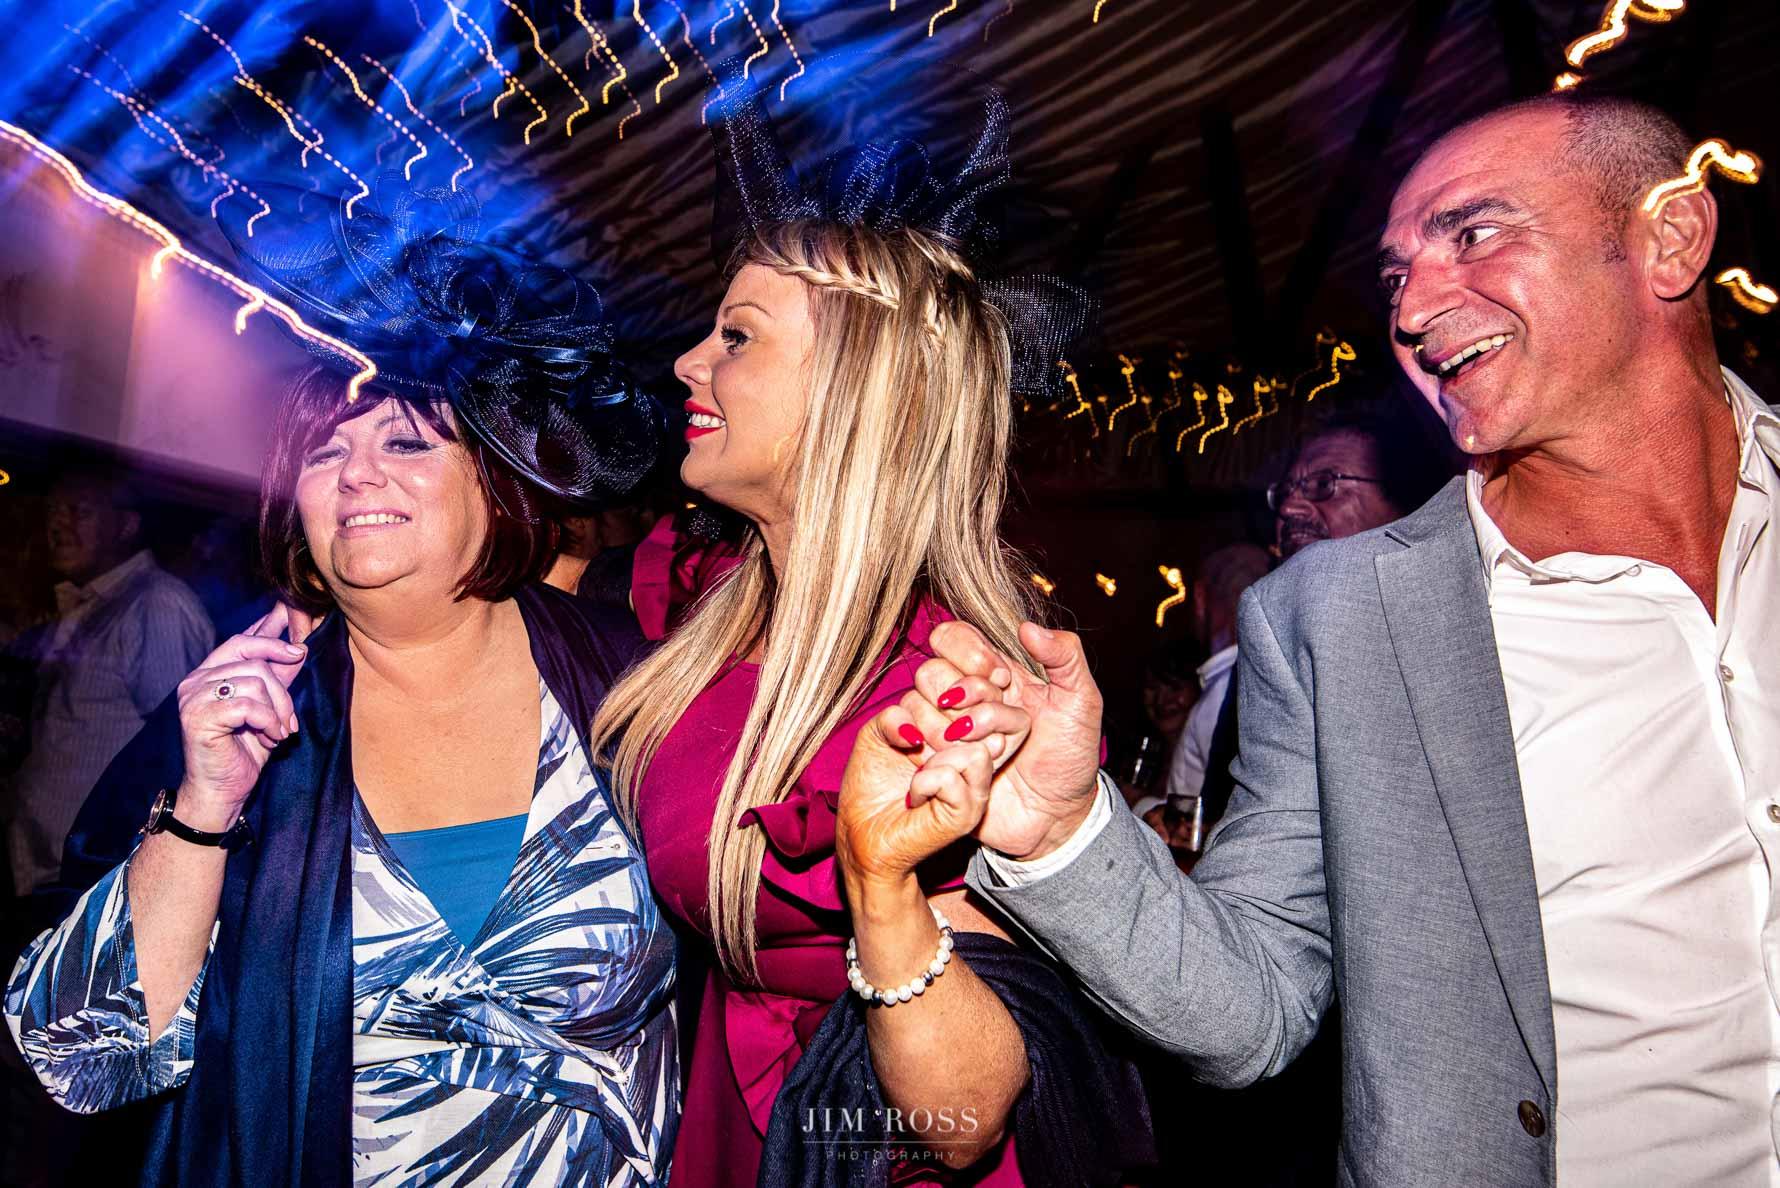 Family wedding party dancing fun